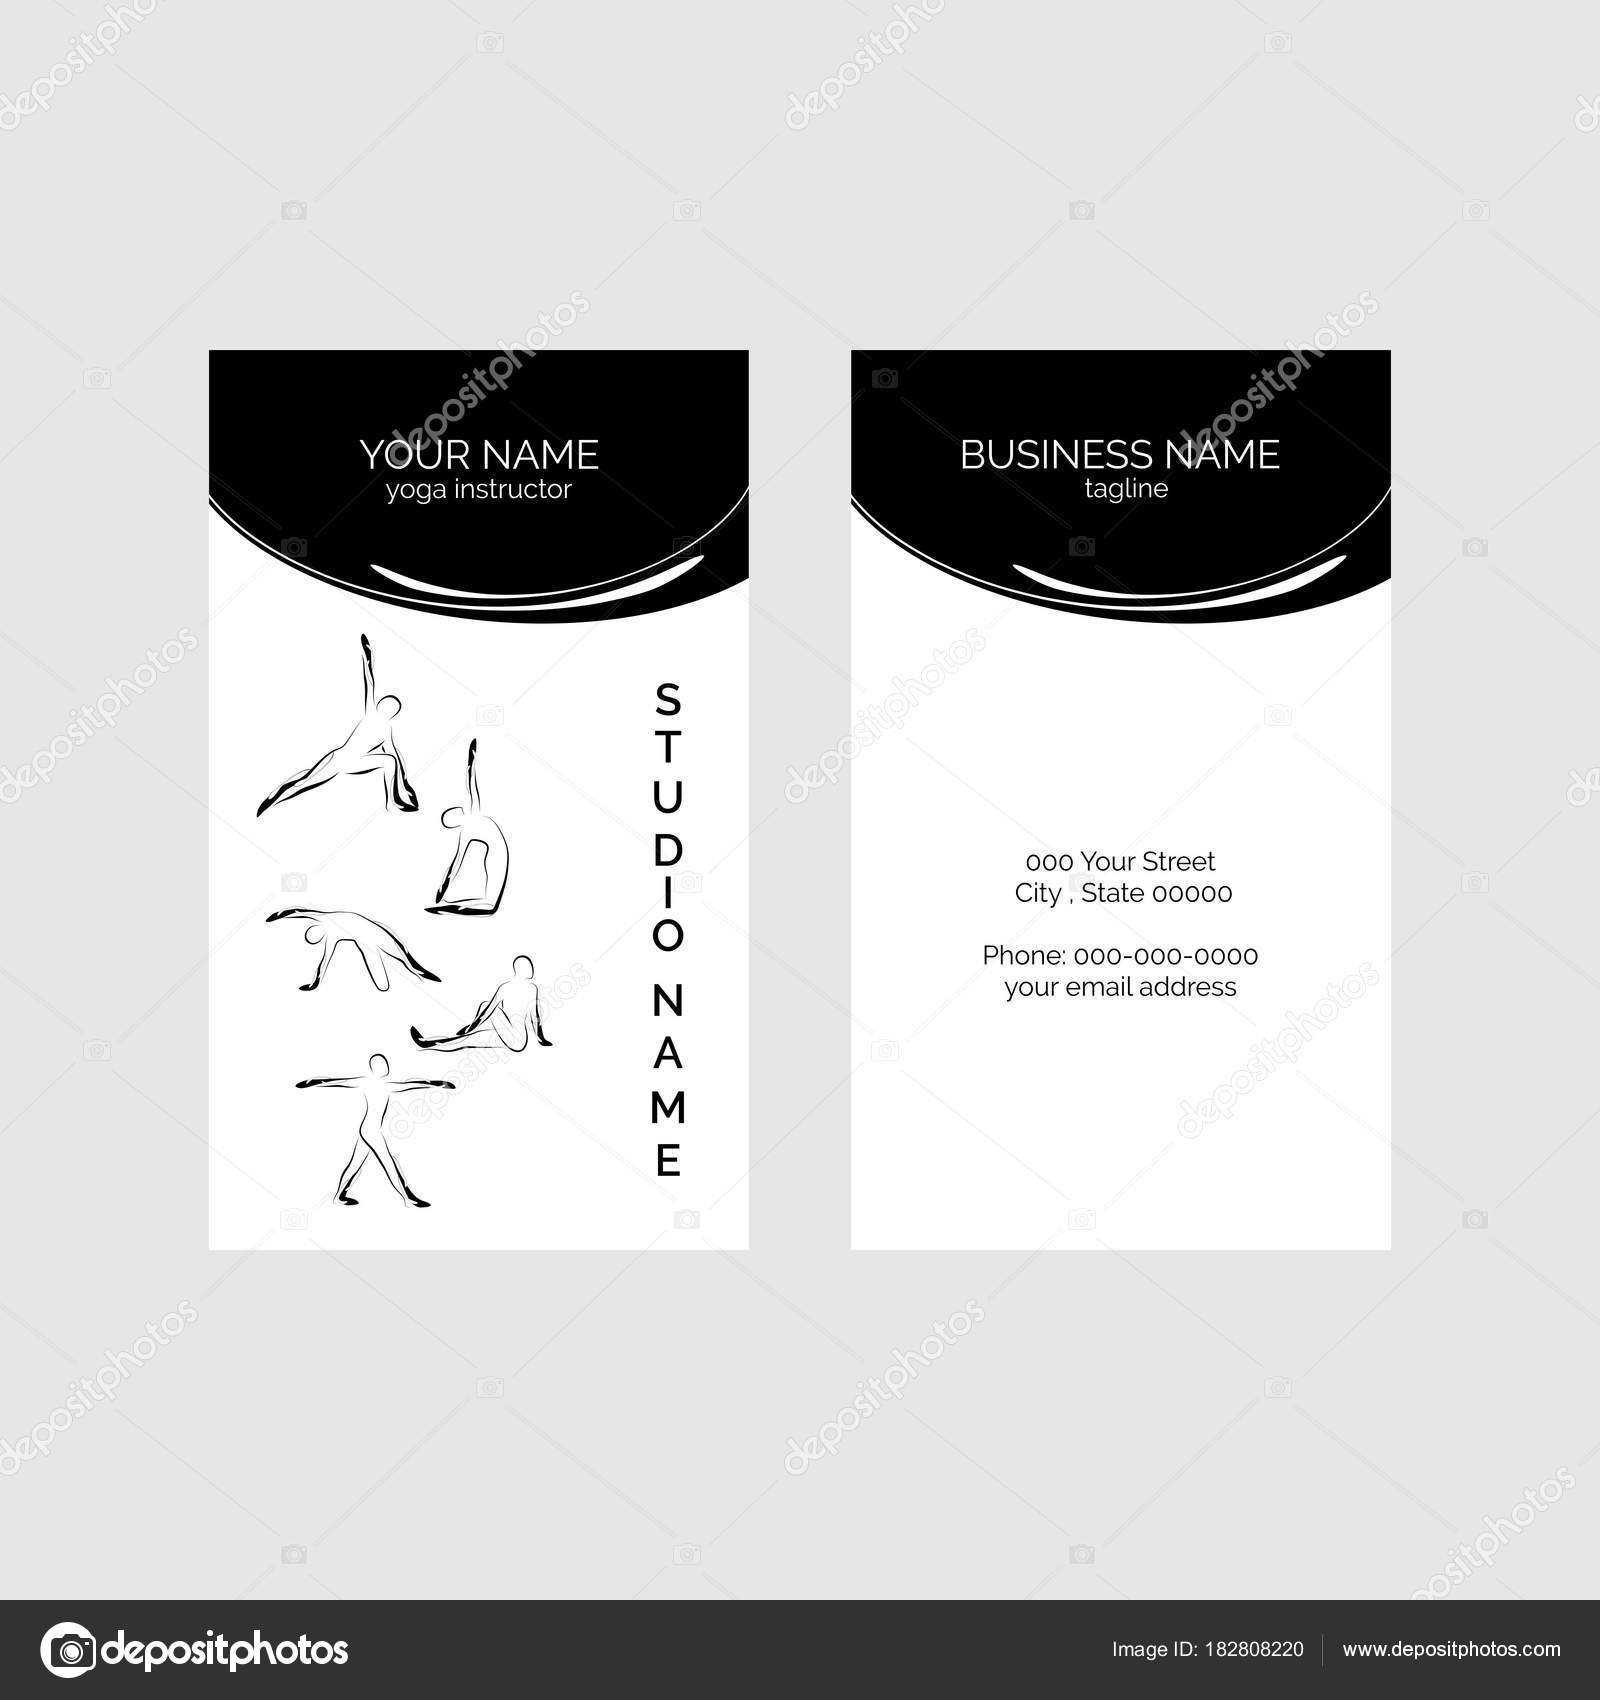 Yoga Visitenkarte Vektor Vorlage — Stockvektor © sashica #182808220